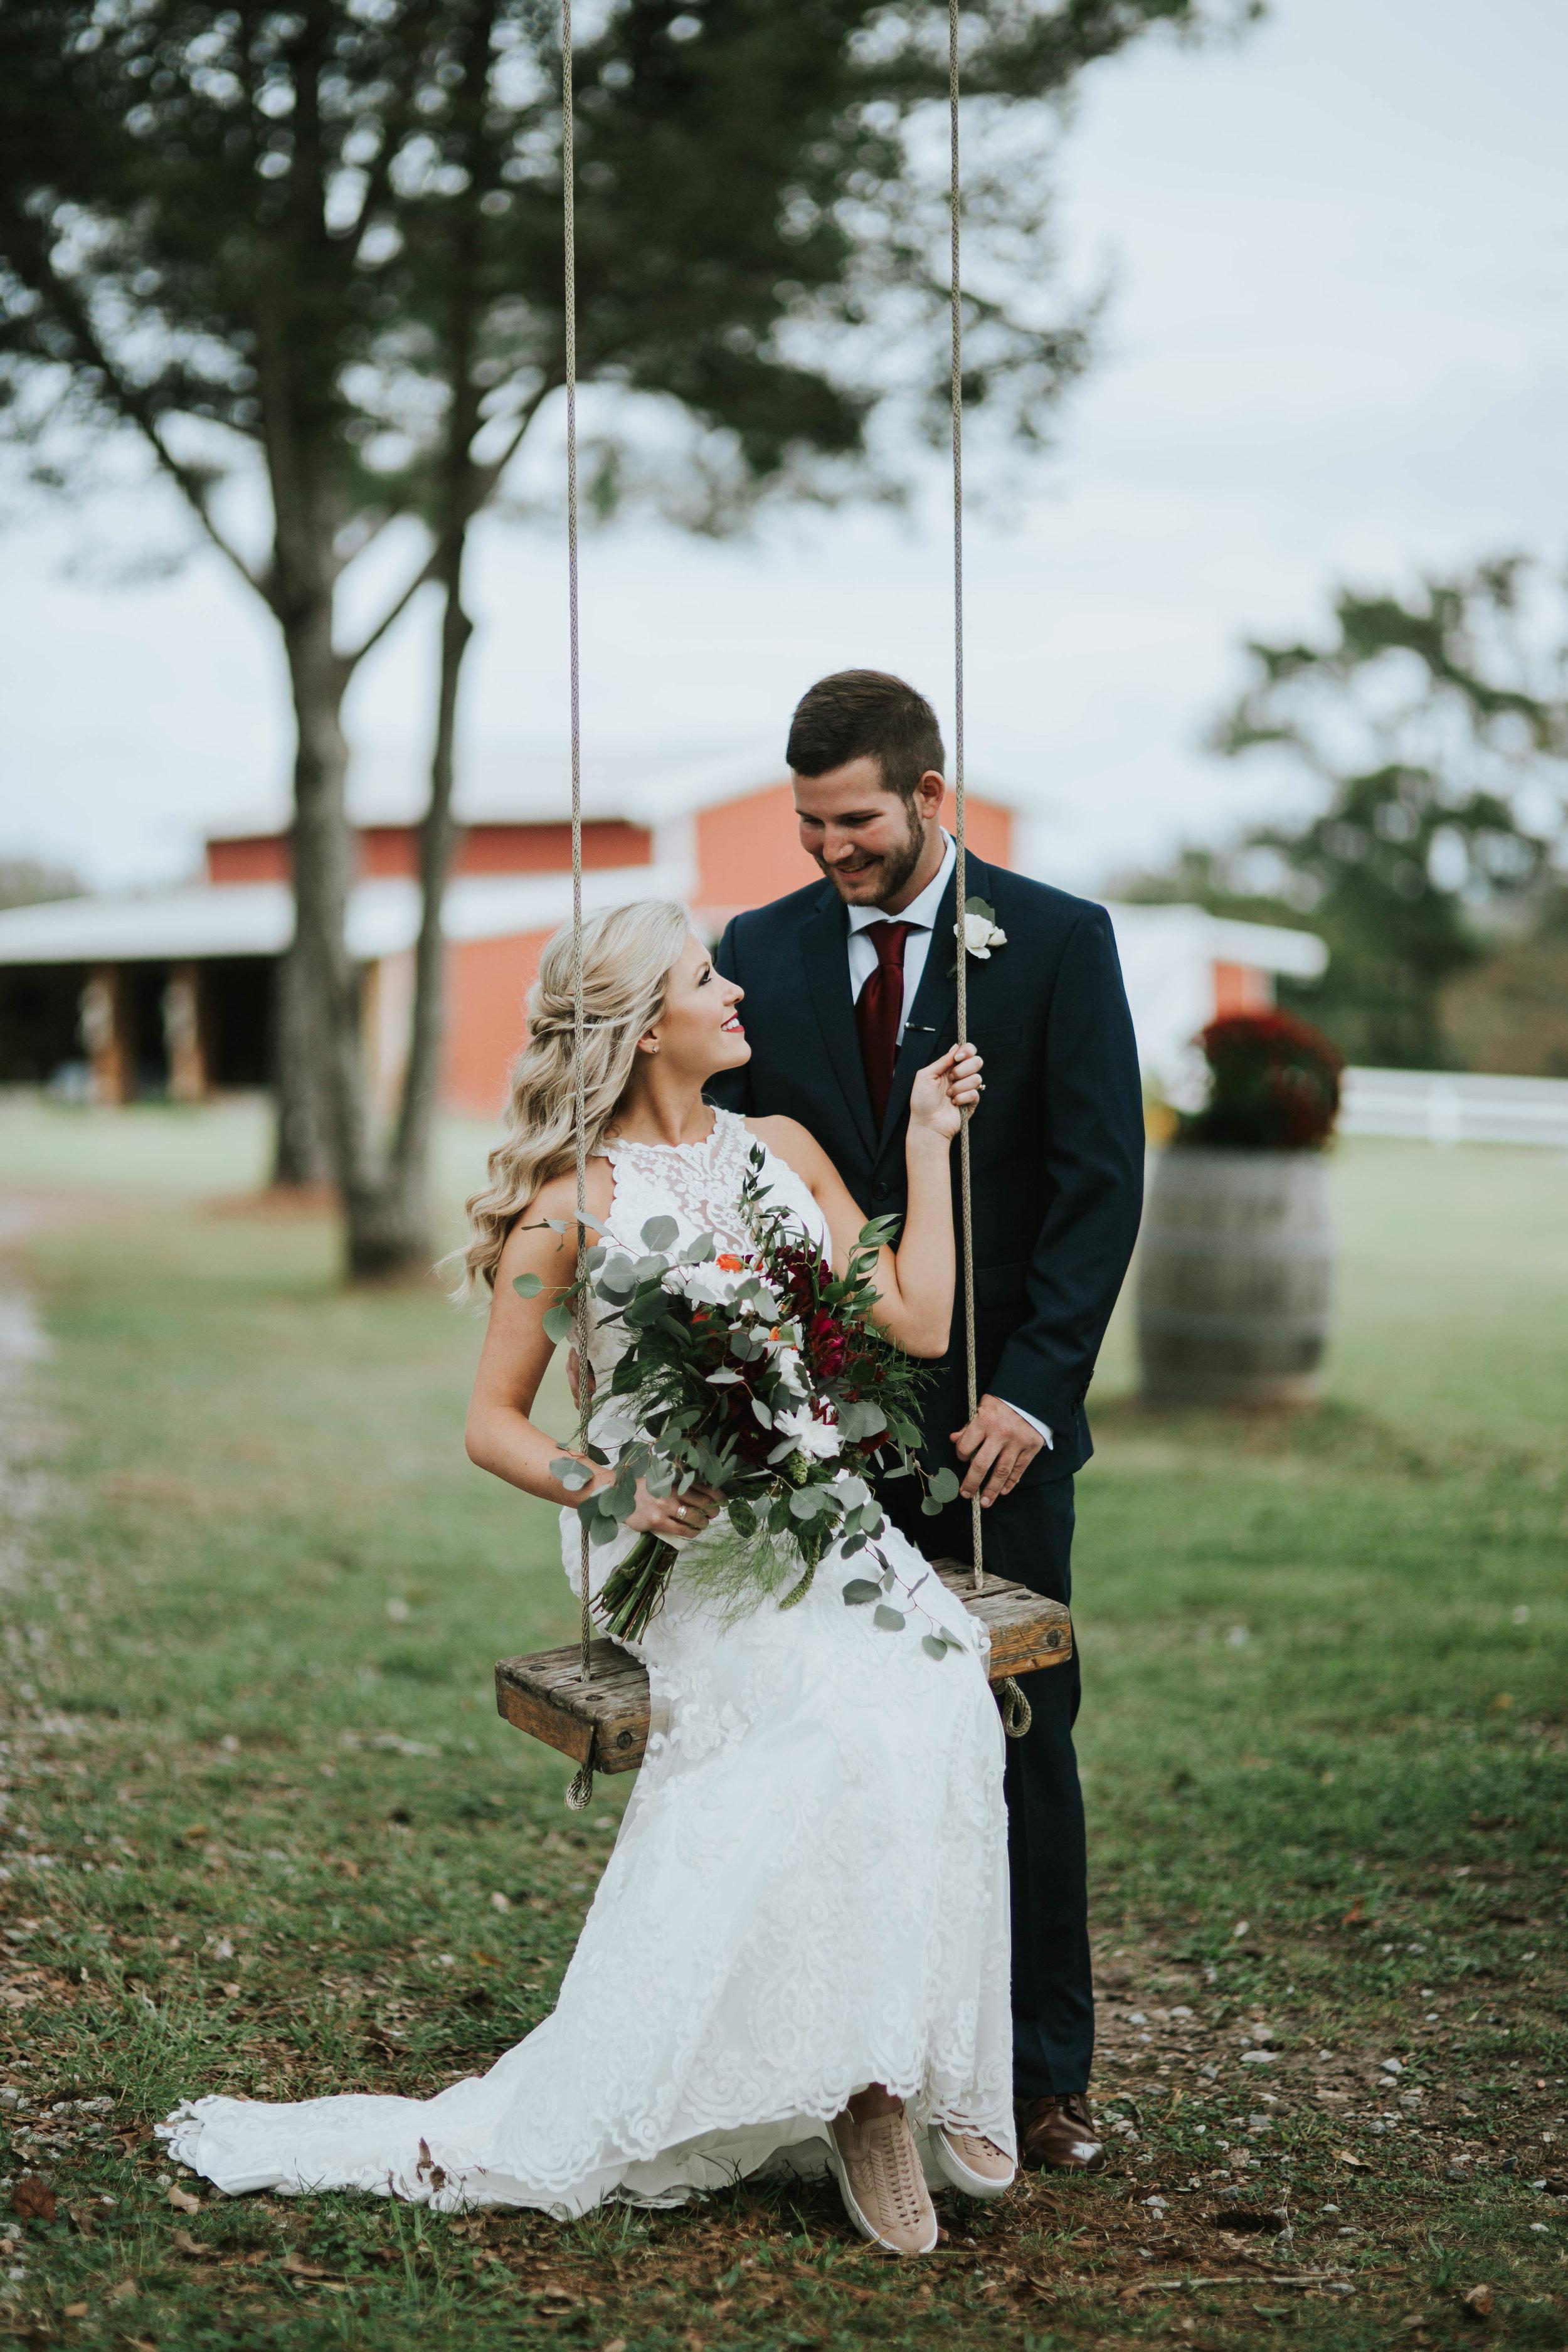 Krista&austin's wedding-197.jpg